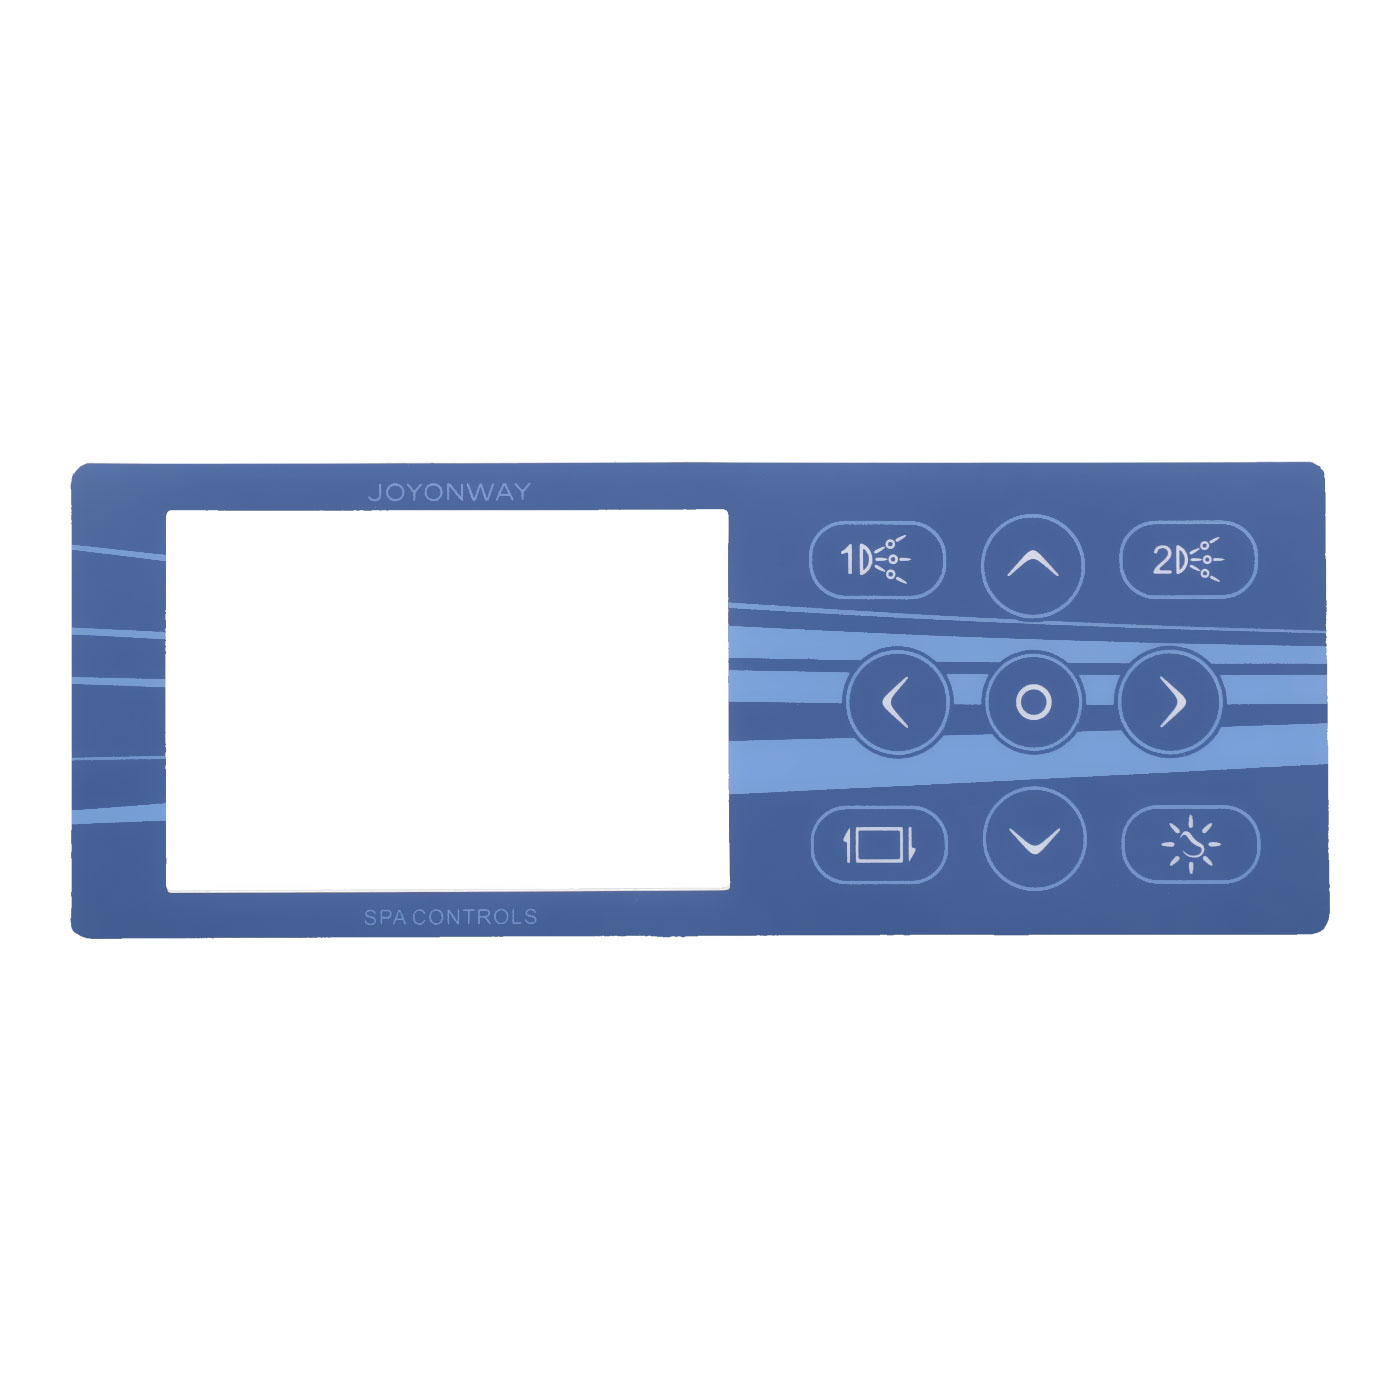 Overlay for PB555 Control Panel